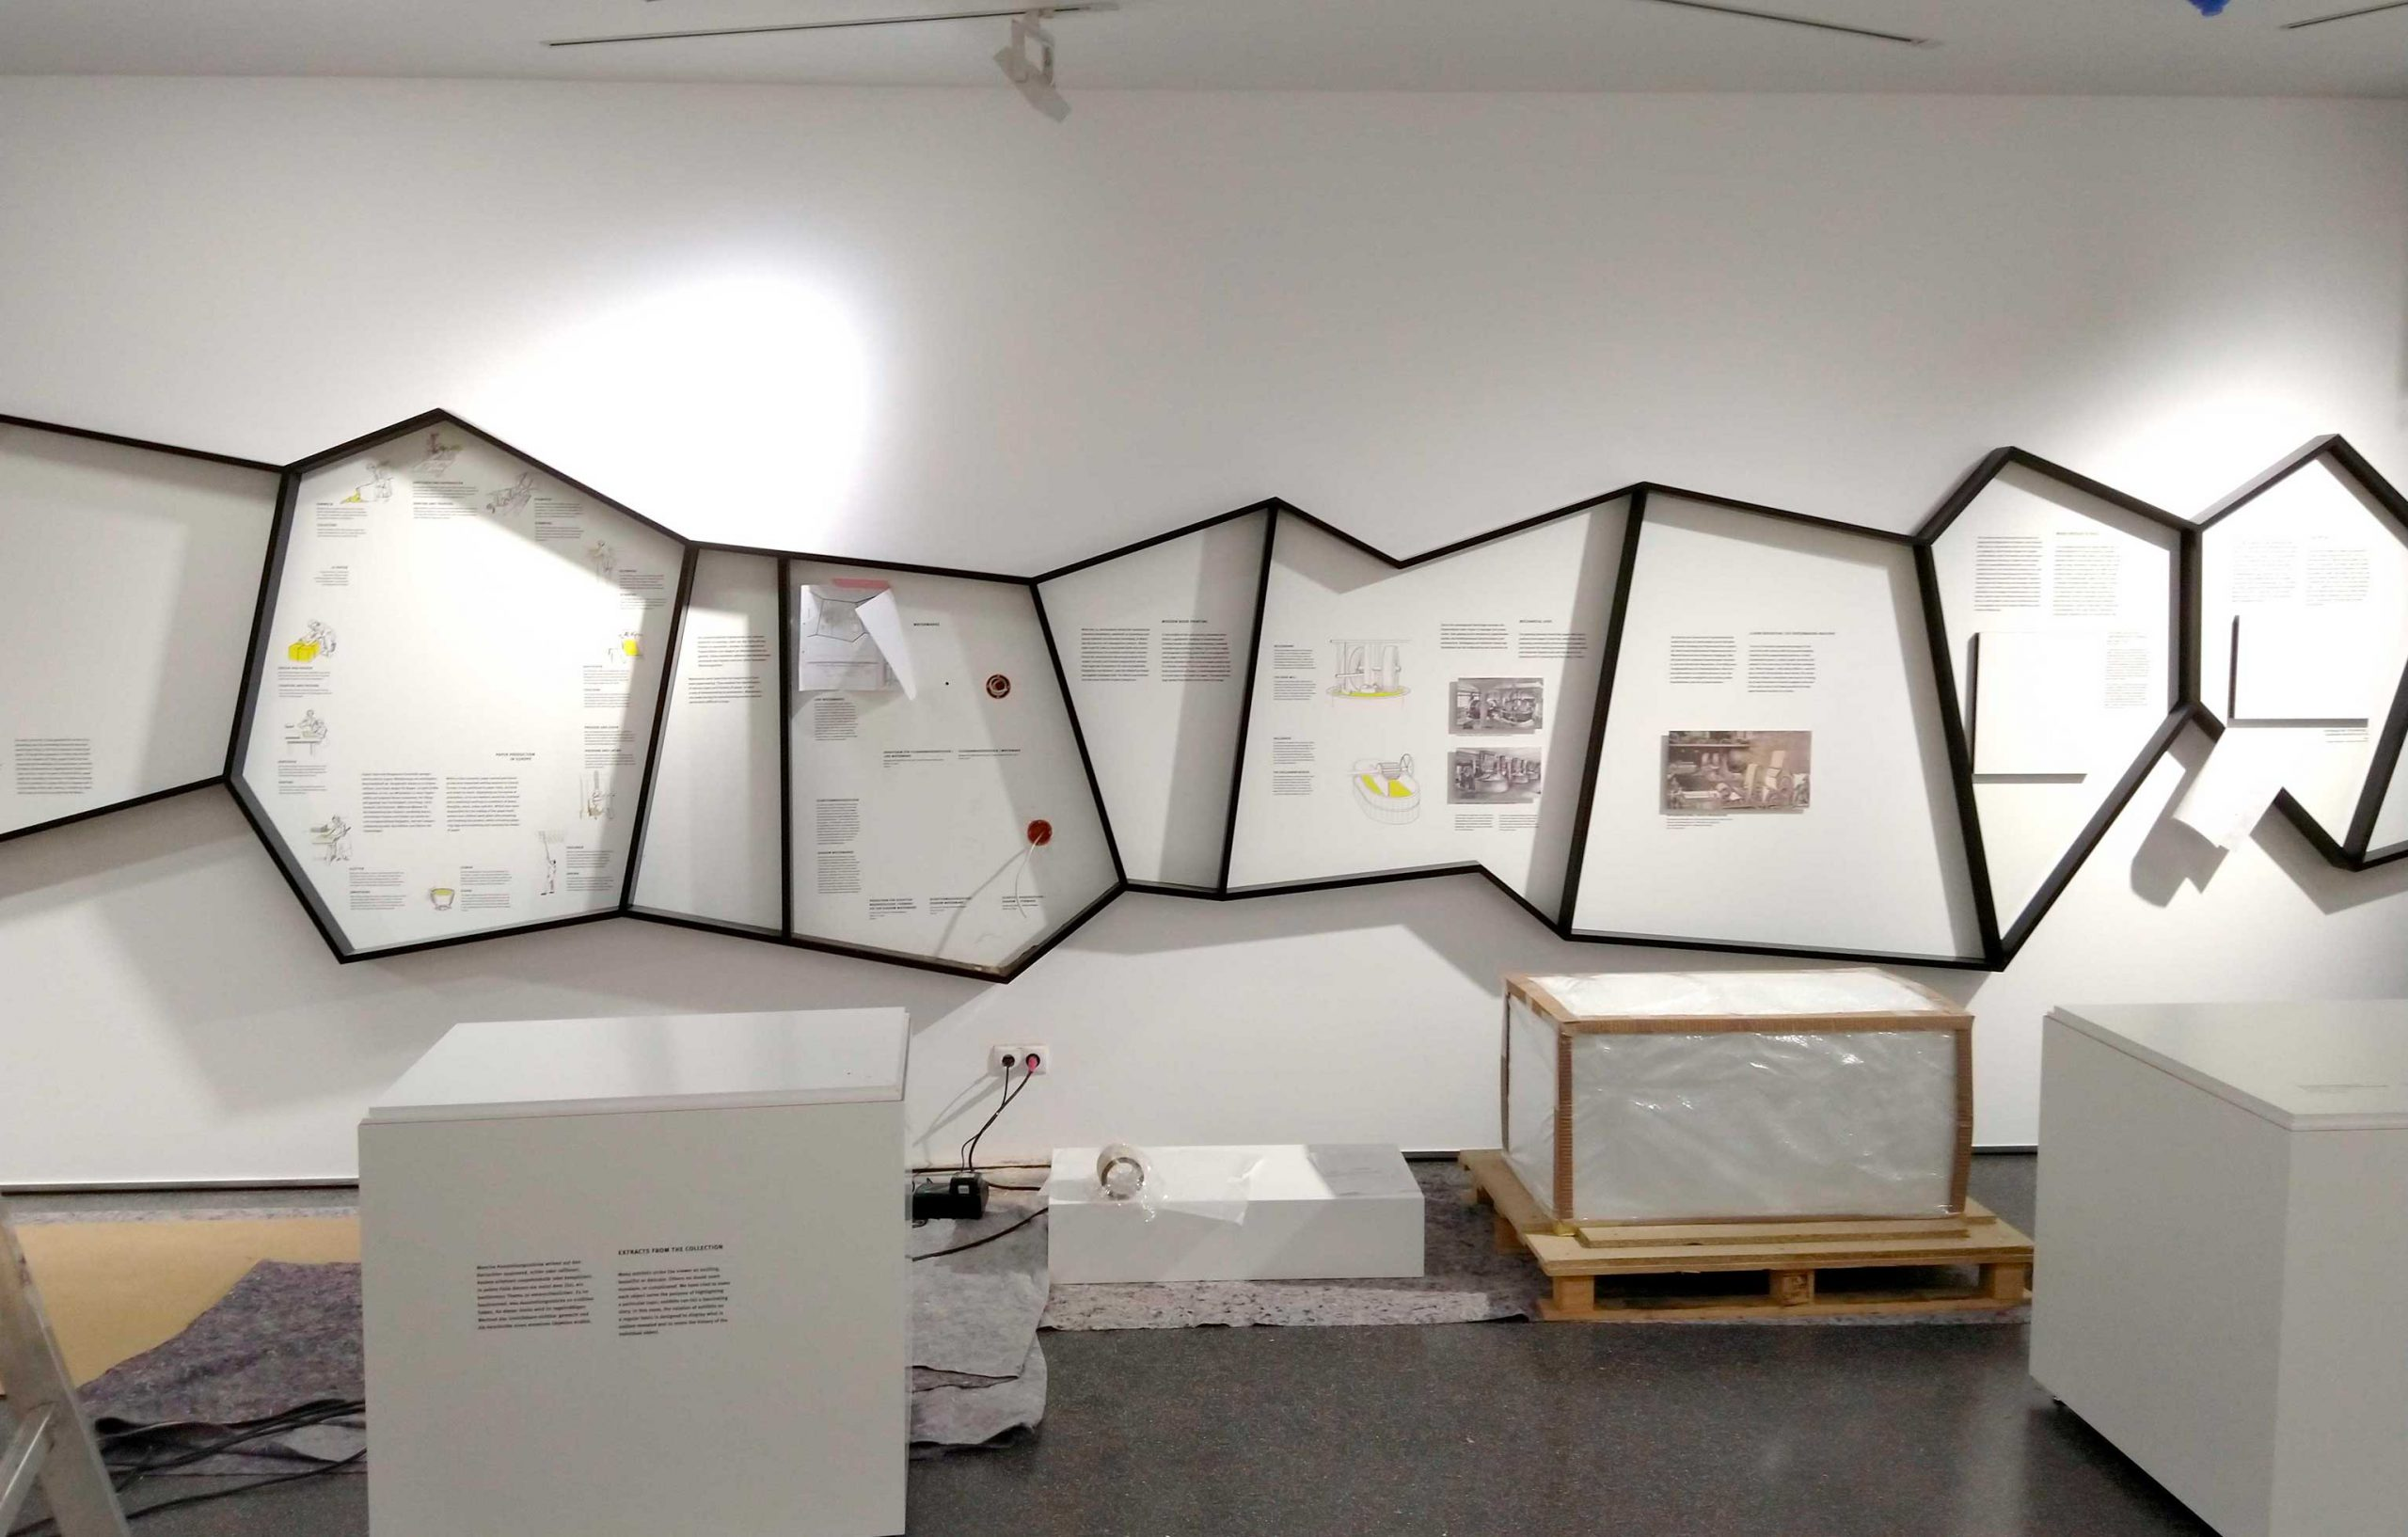 Im Papiermuseum Düren sind organisch geformte Ausstellungselemente an die Wand montiert.